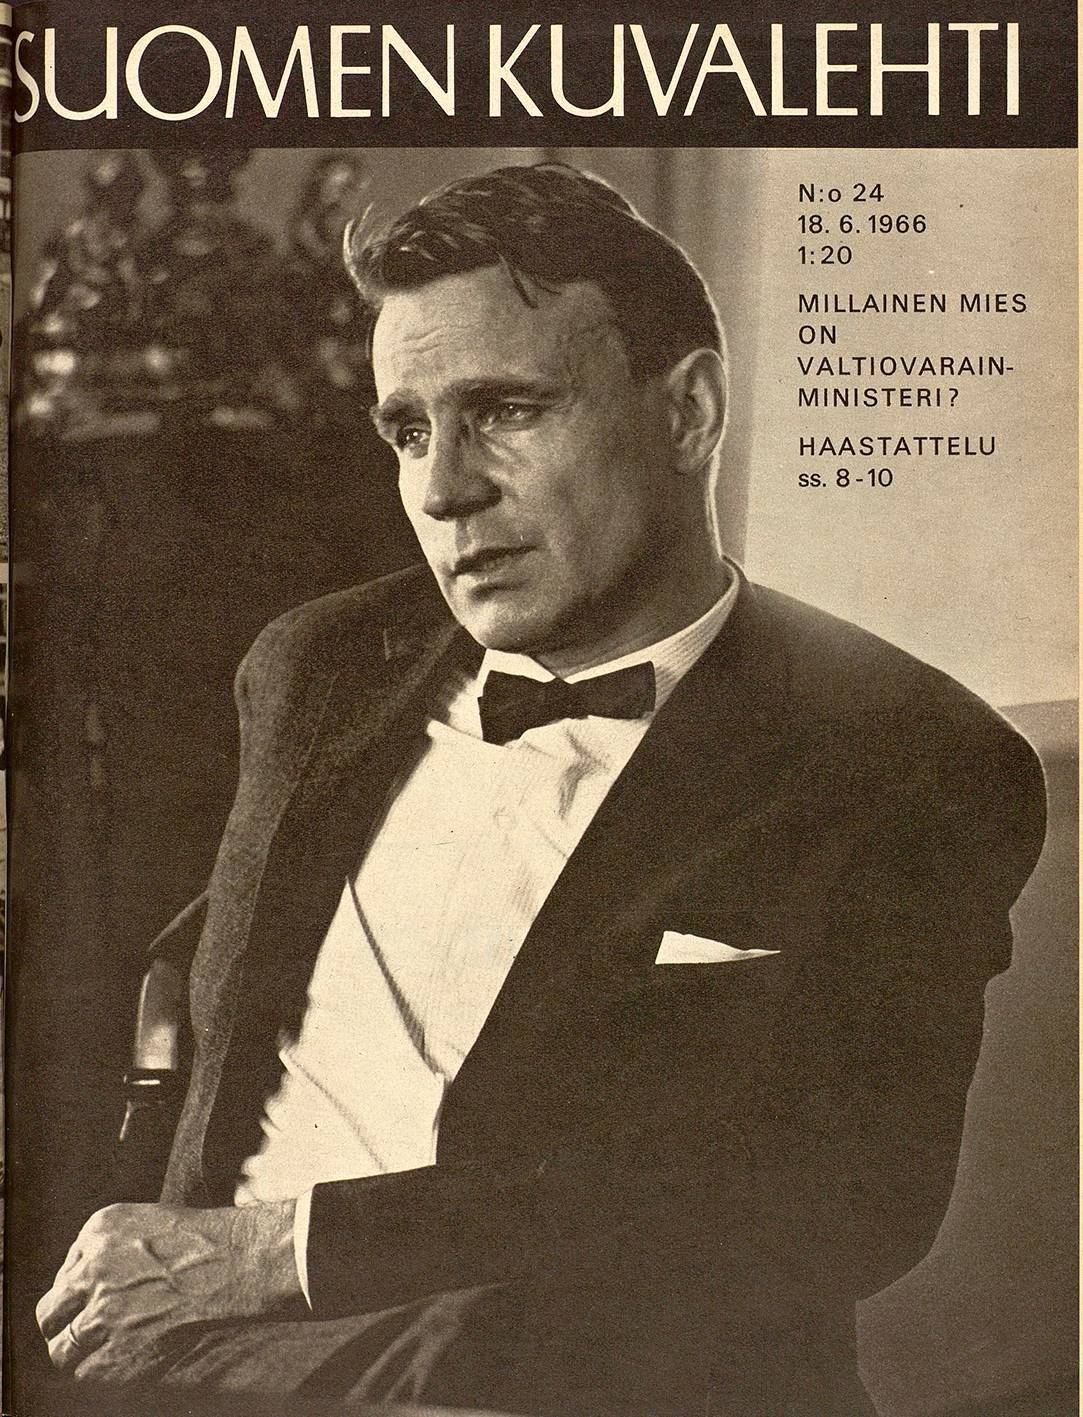 SK 24/1966